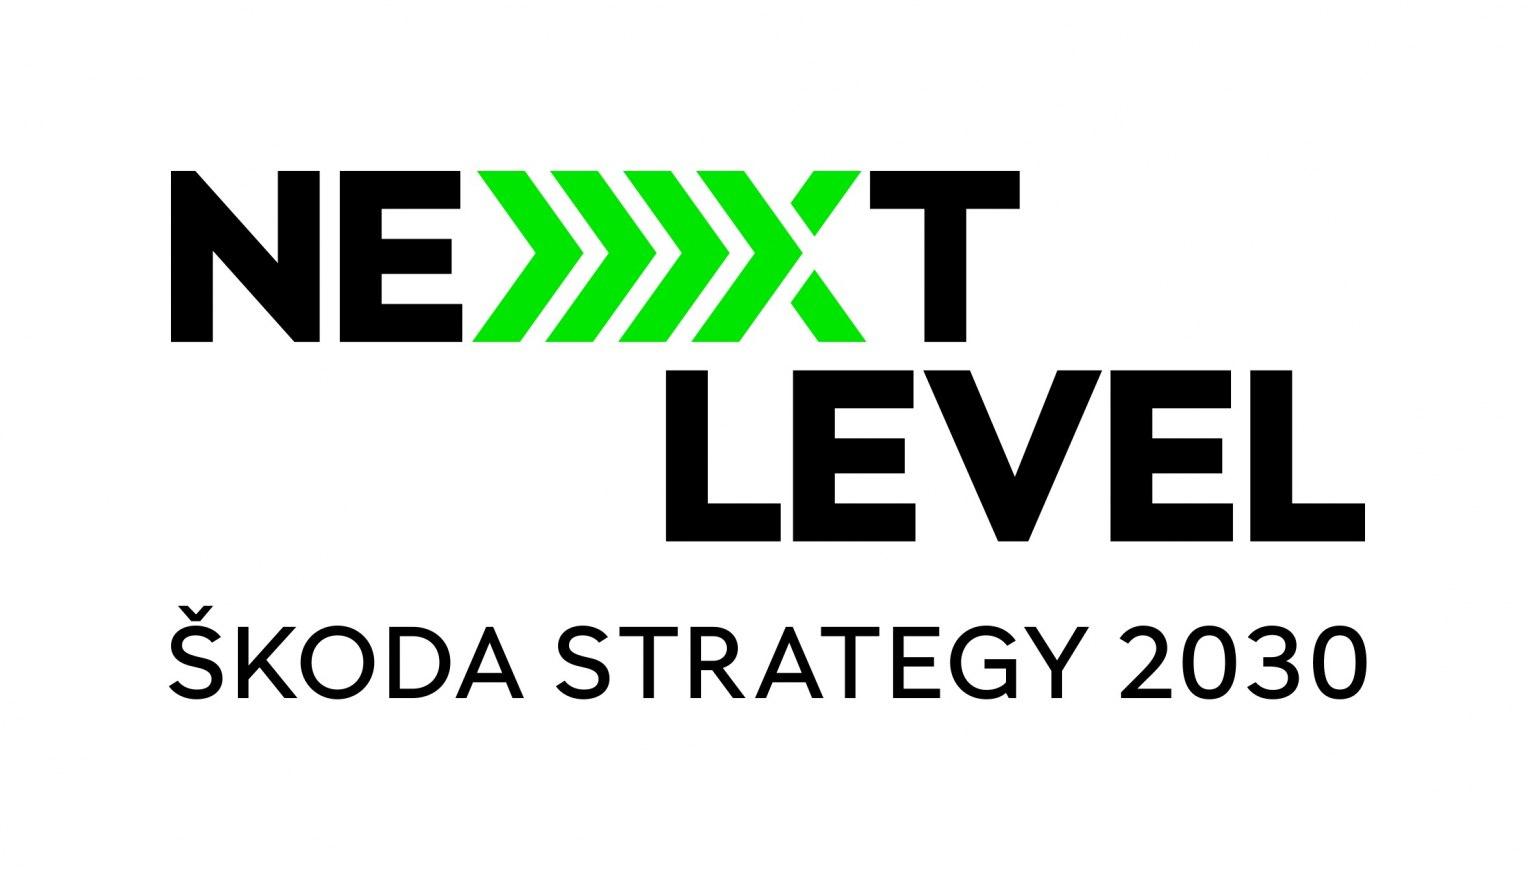 SKODA NEXT LEVEL SKODA STRATEGY 2030 Πώς θα είναι η Skoda το 2030 Skoda, ειδήσεις, Νέα